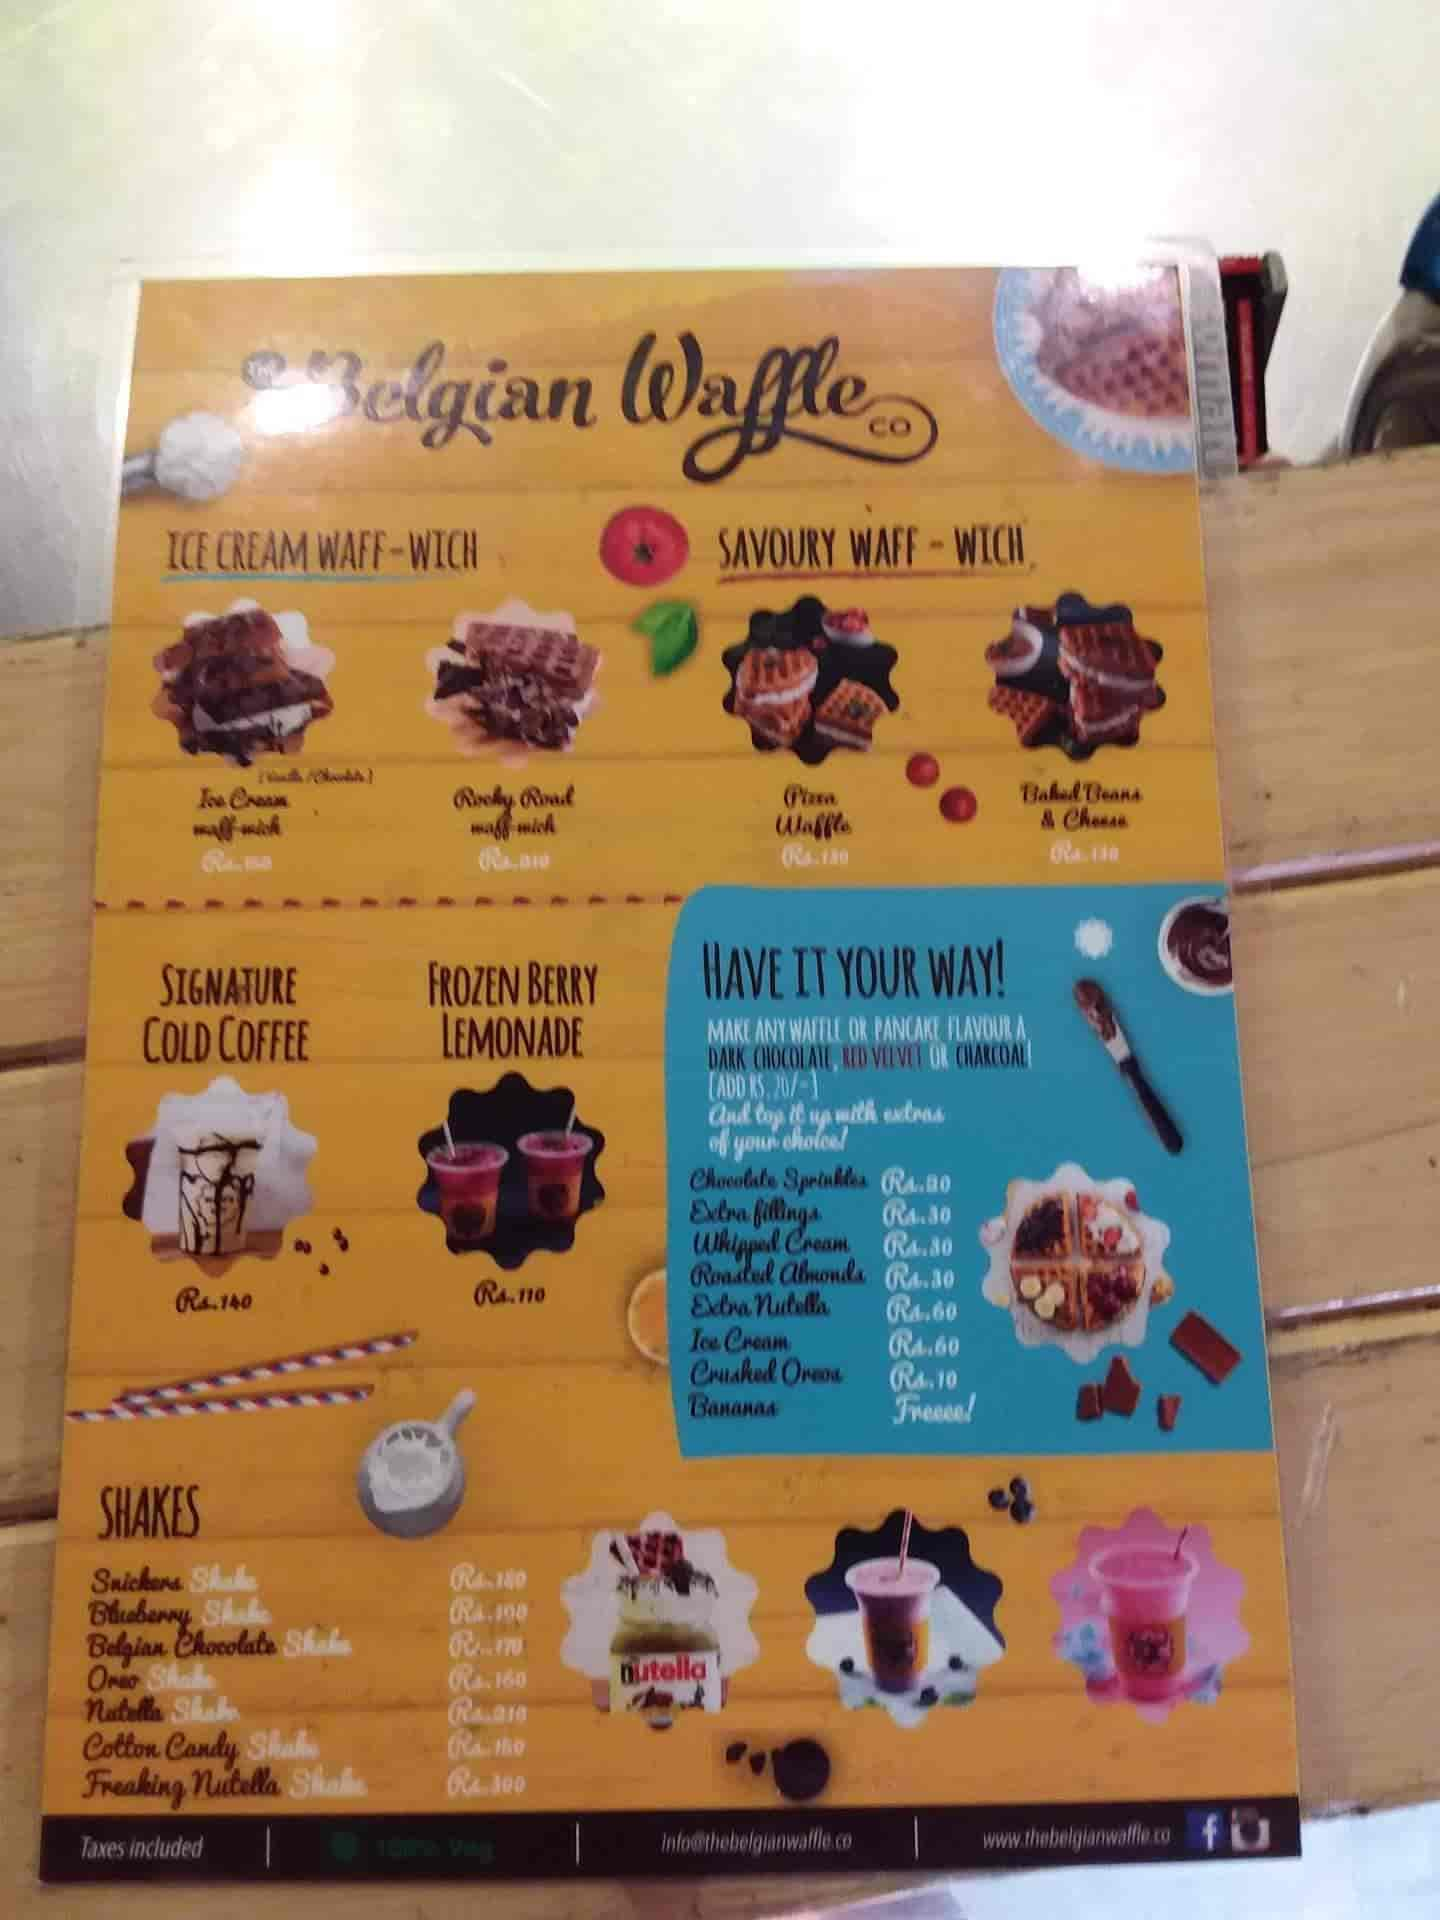 The Belgian Waffle Co, Lajpat Nagar, Delhi - Waffle Centres